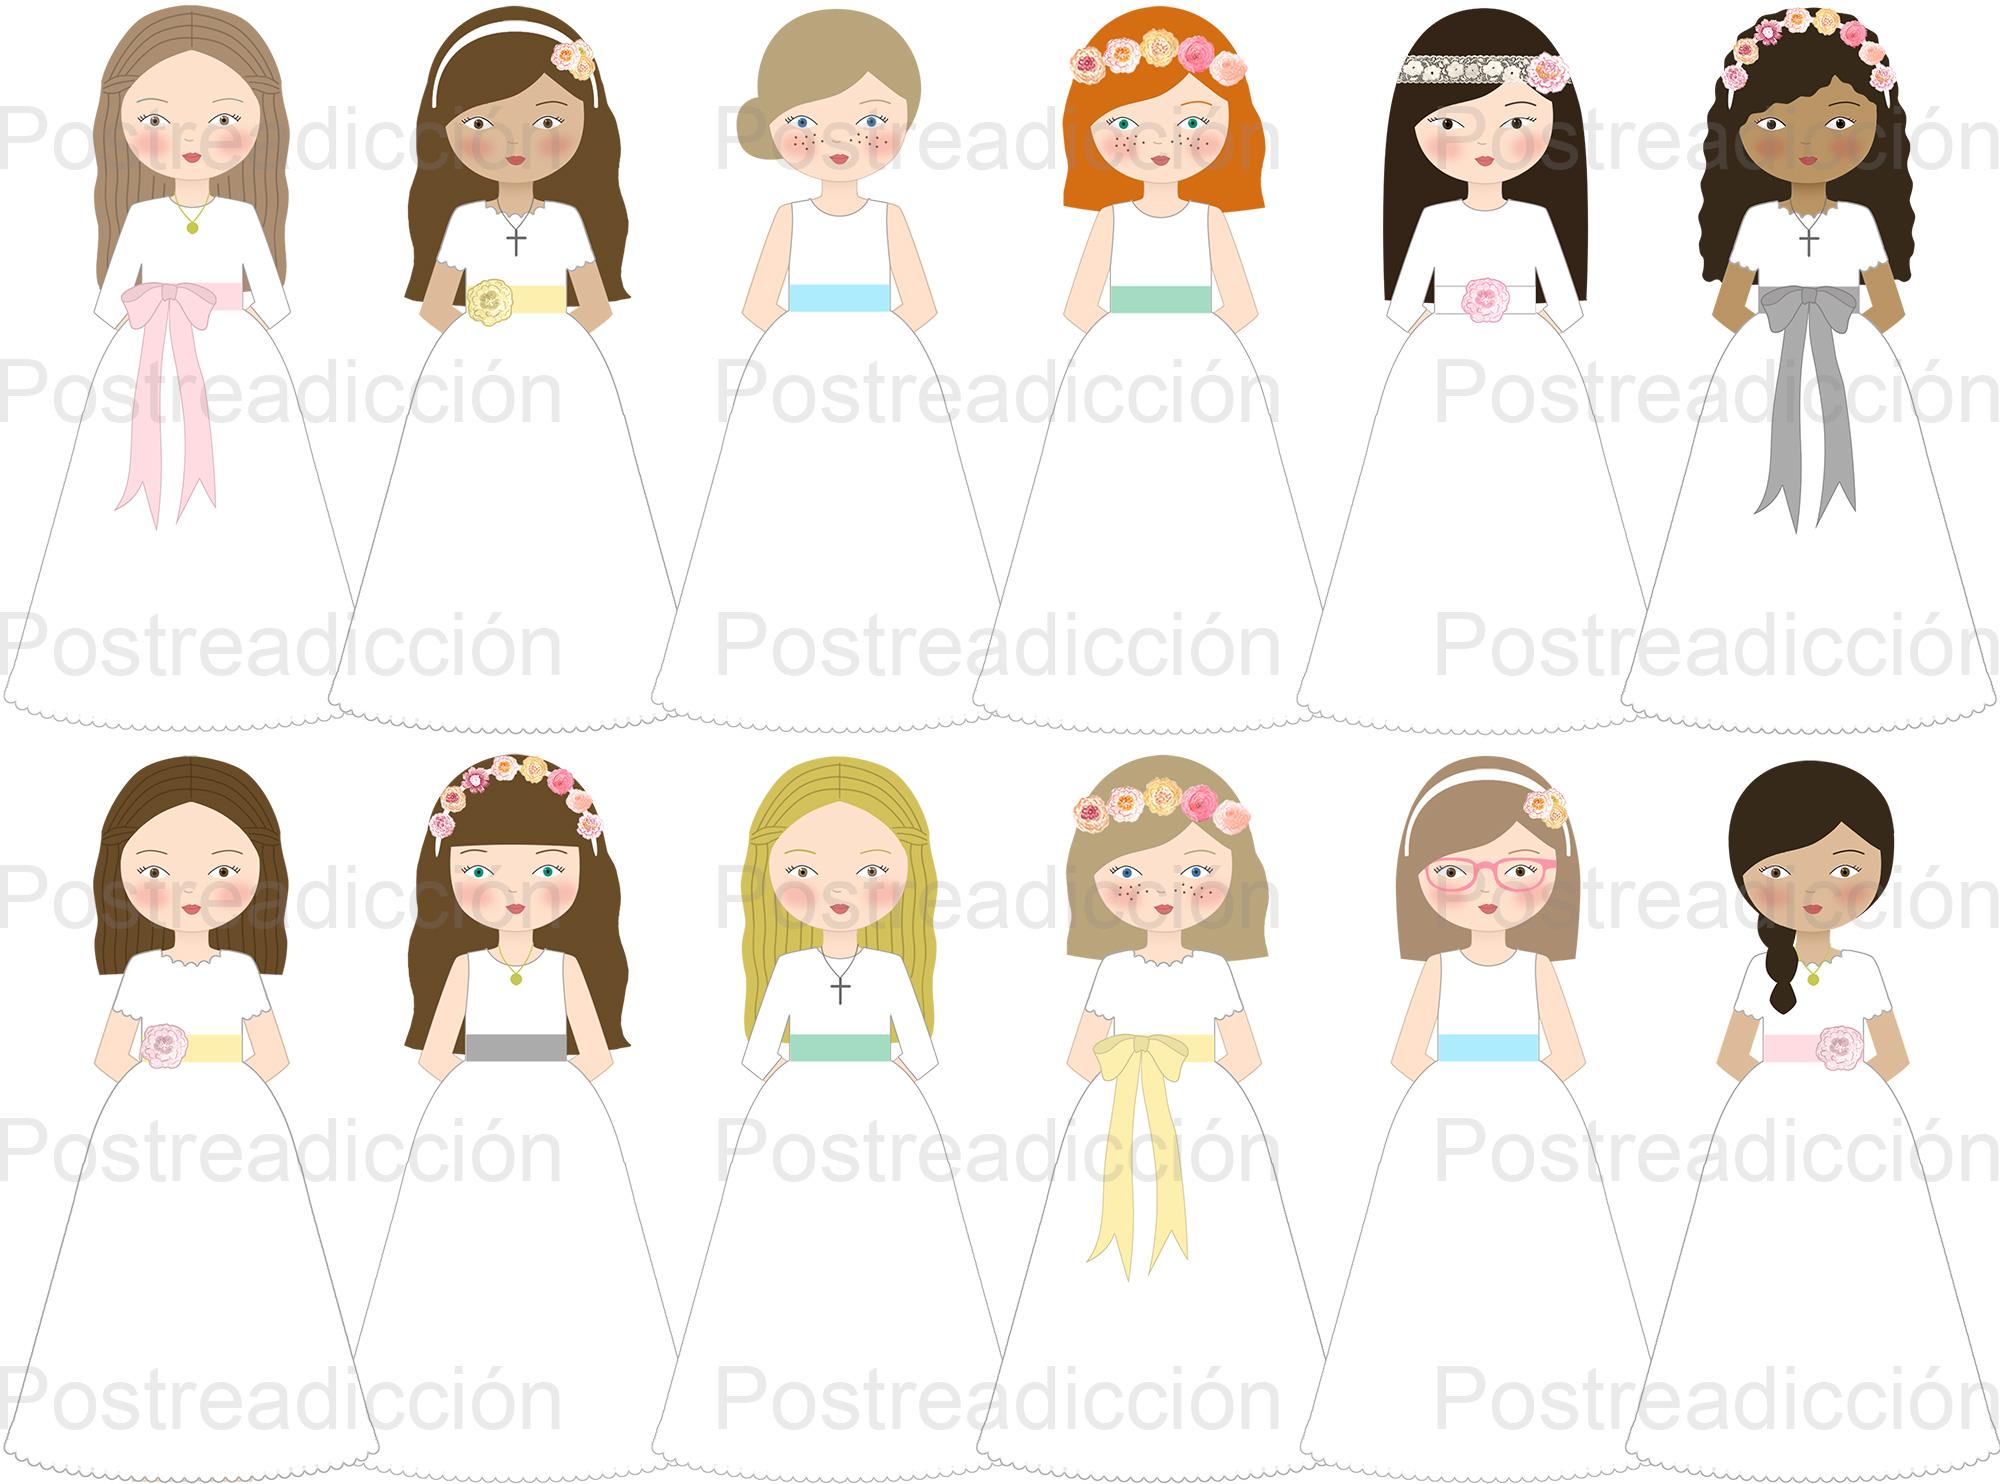 Imagen de producto: https://tienda.postreadiccion.com/img/articulos/secundarias3786-modelo-no-475-nina-de-comunion-modelo-carlota-1.jpg